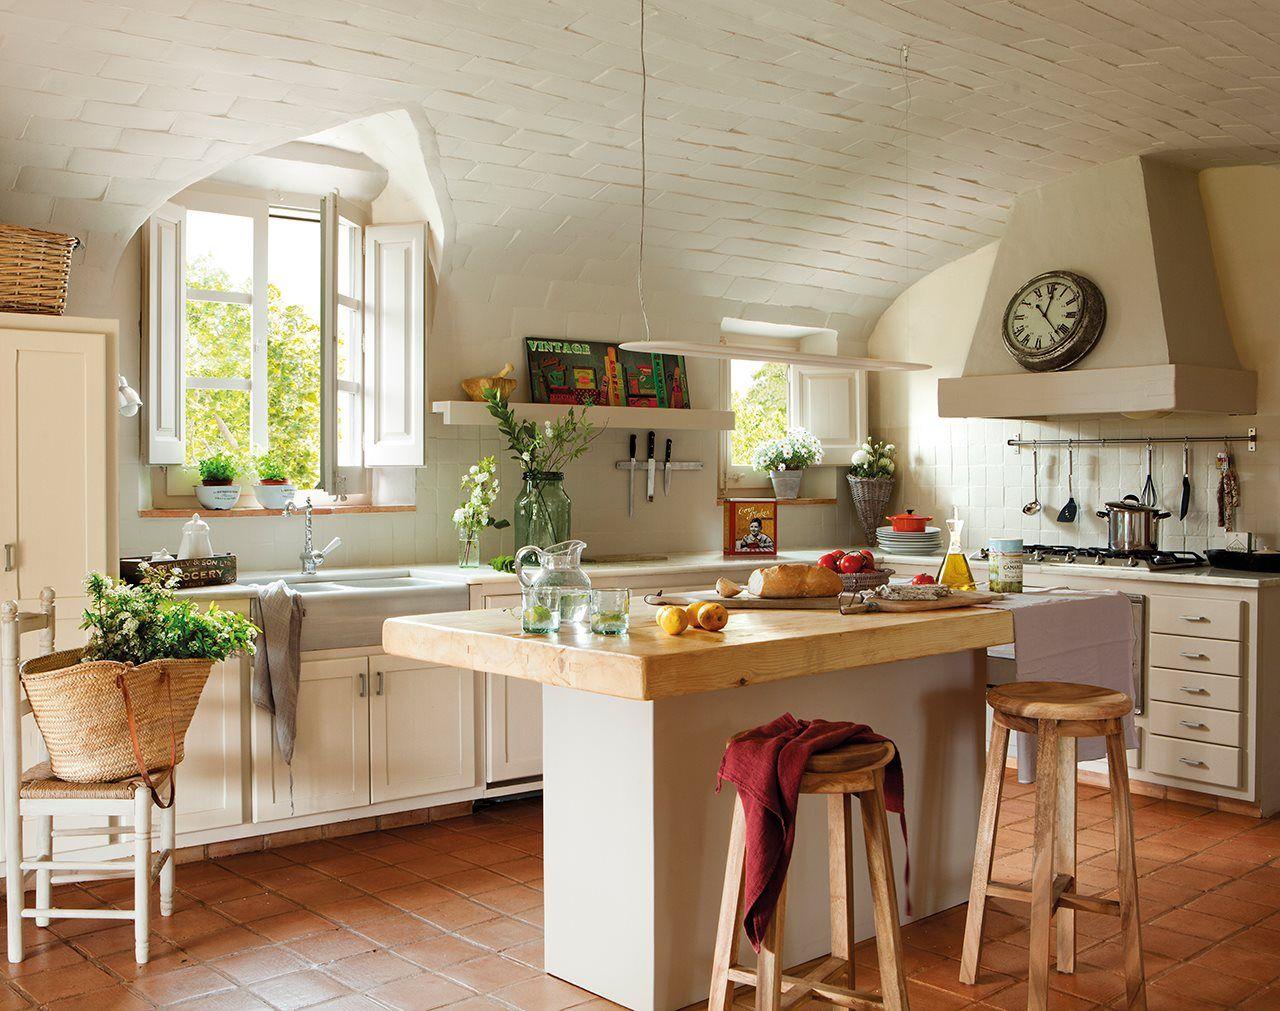 Cocina | Kitchens, Interiors and Kitchen design